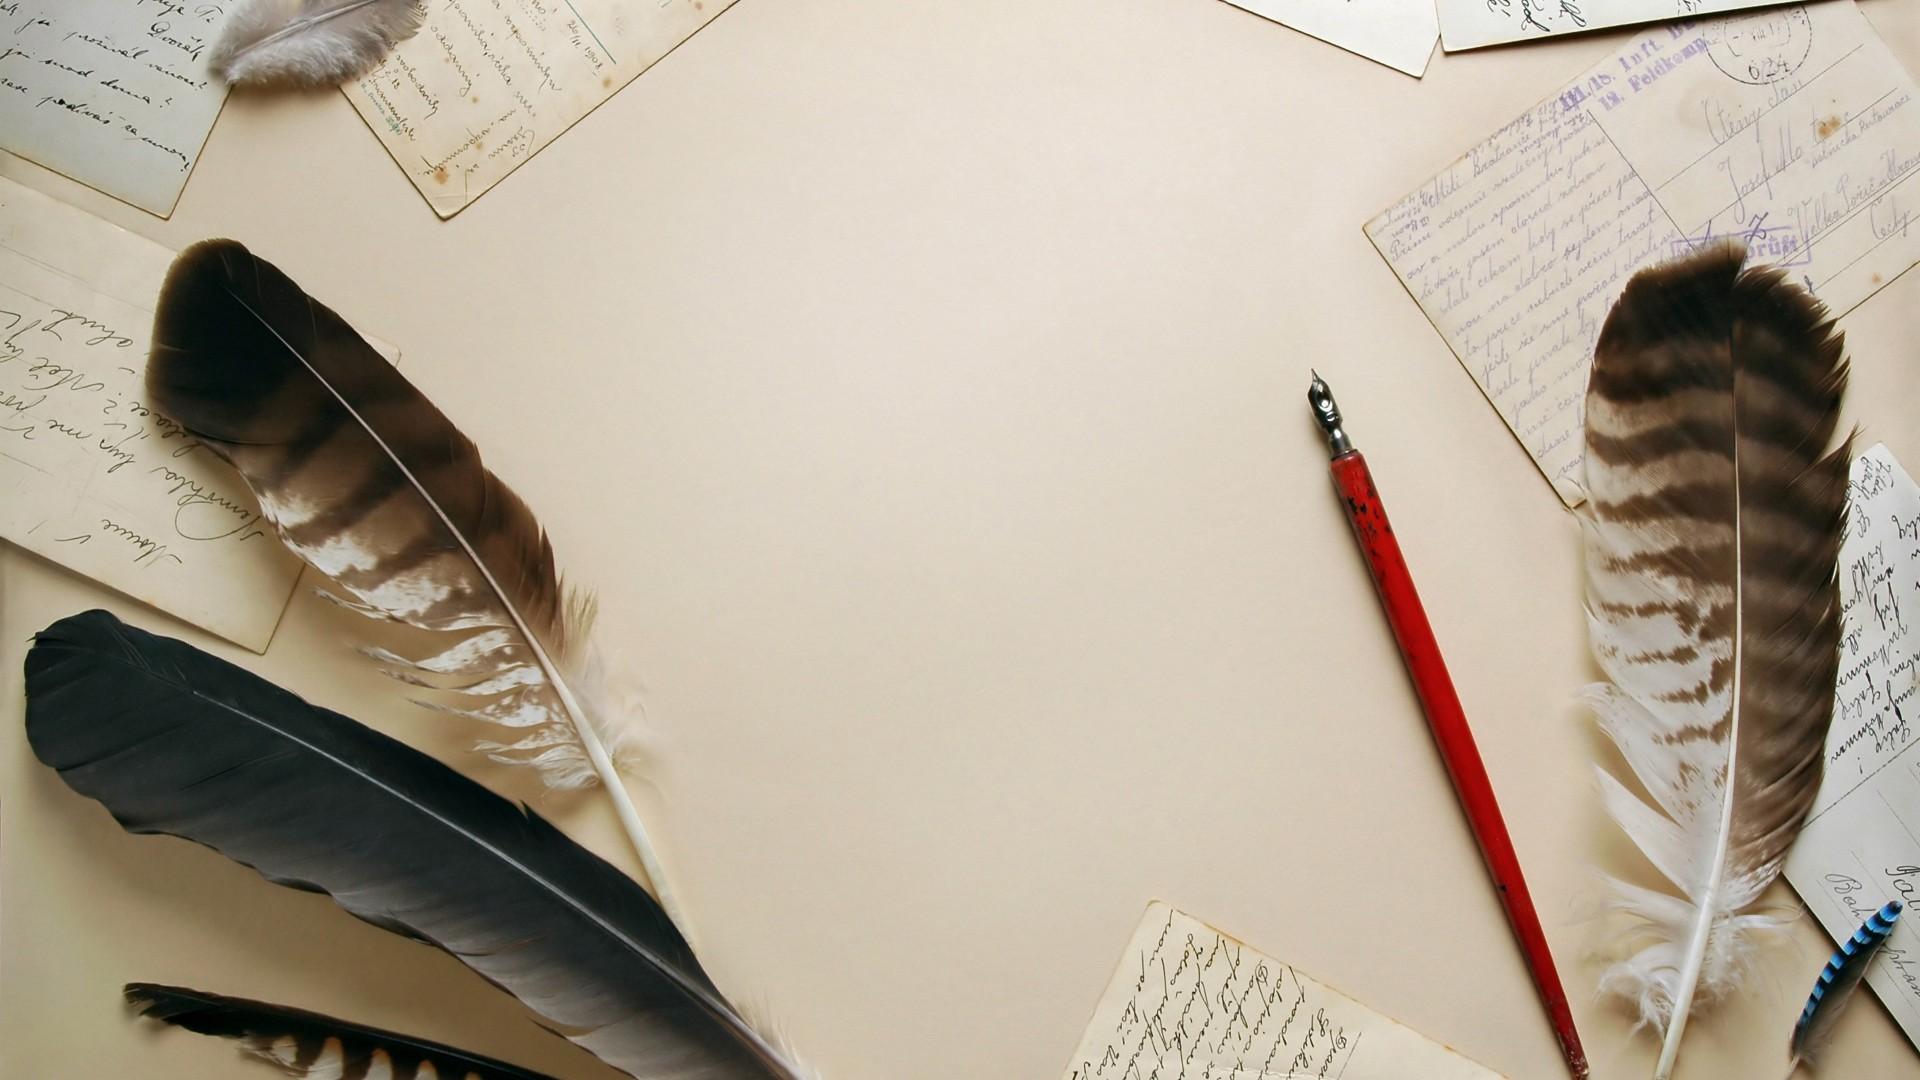 Writing Pen Wallpaper Pen and Ink Wal...